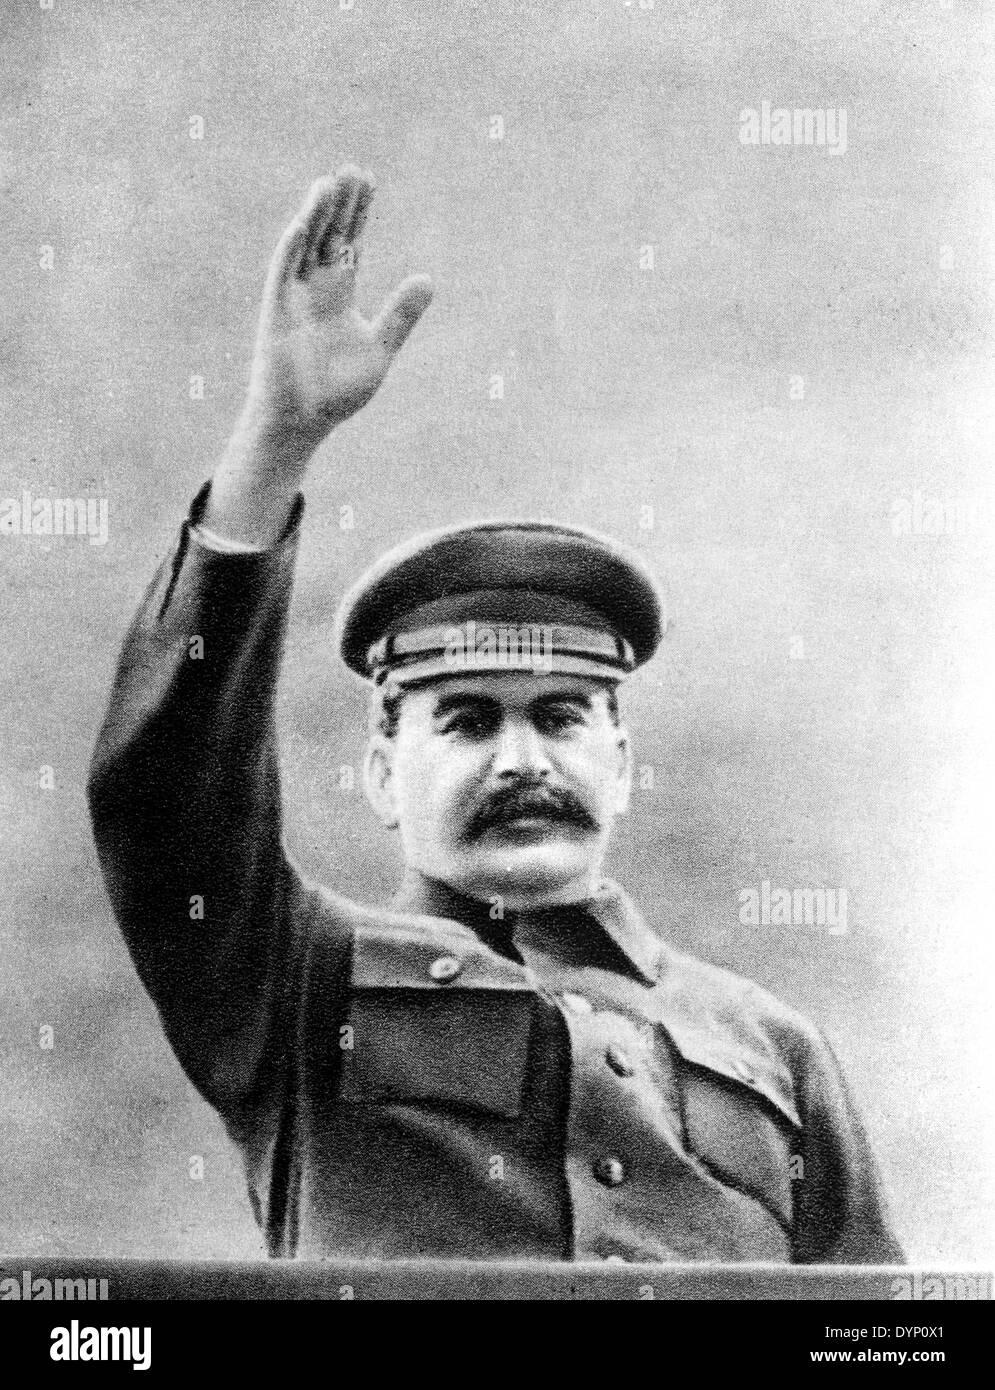 Joseph Stalin (1878-1953), leader of the Soviet Union - Stock Image